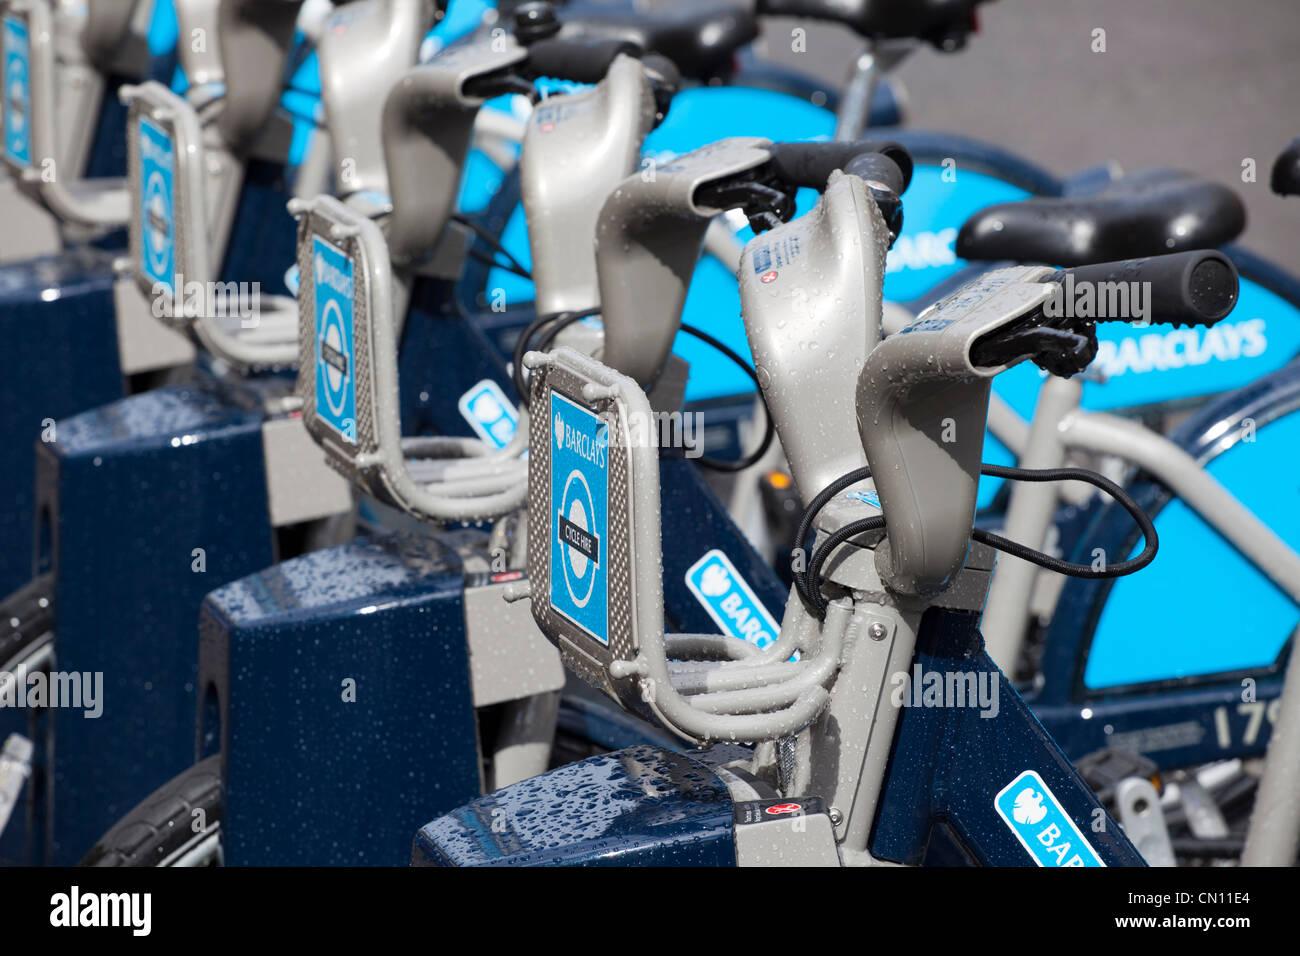 Boris' Bikes scheme, London, UK - Stock Image